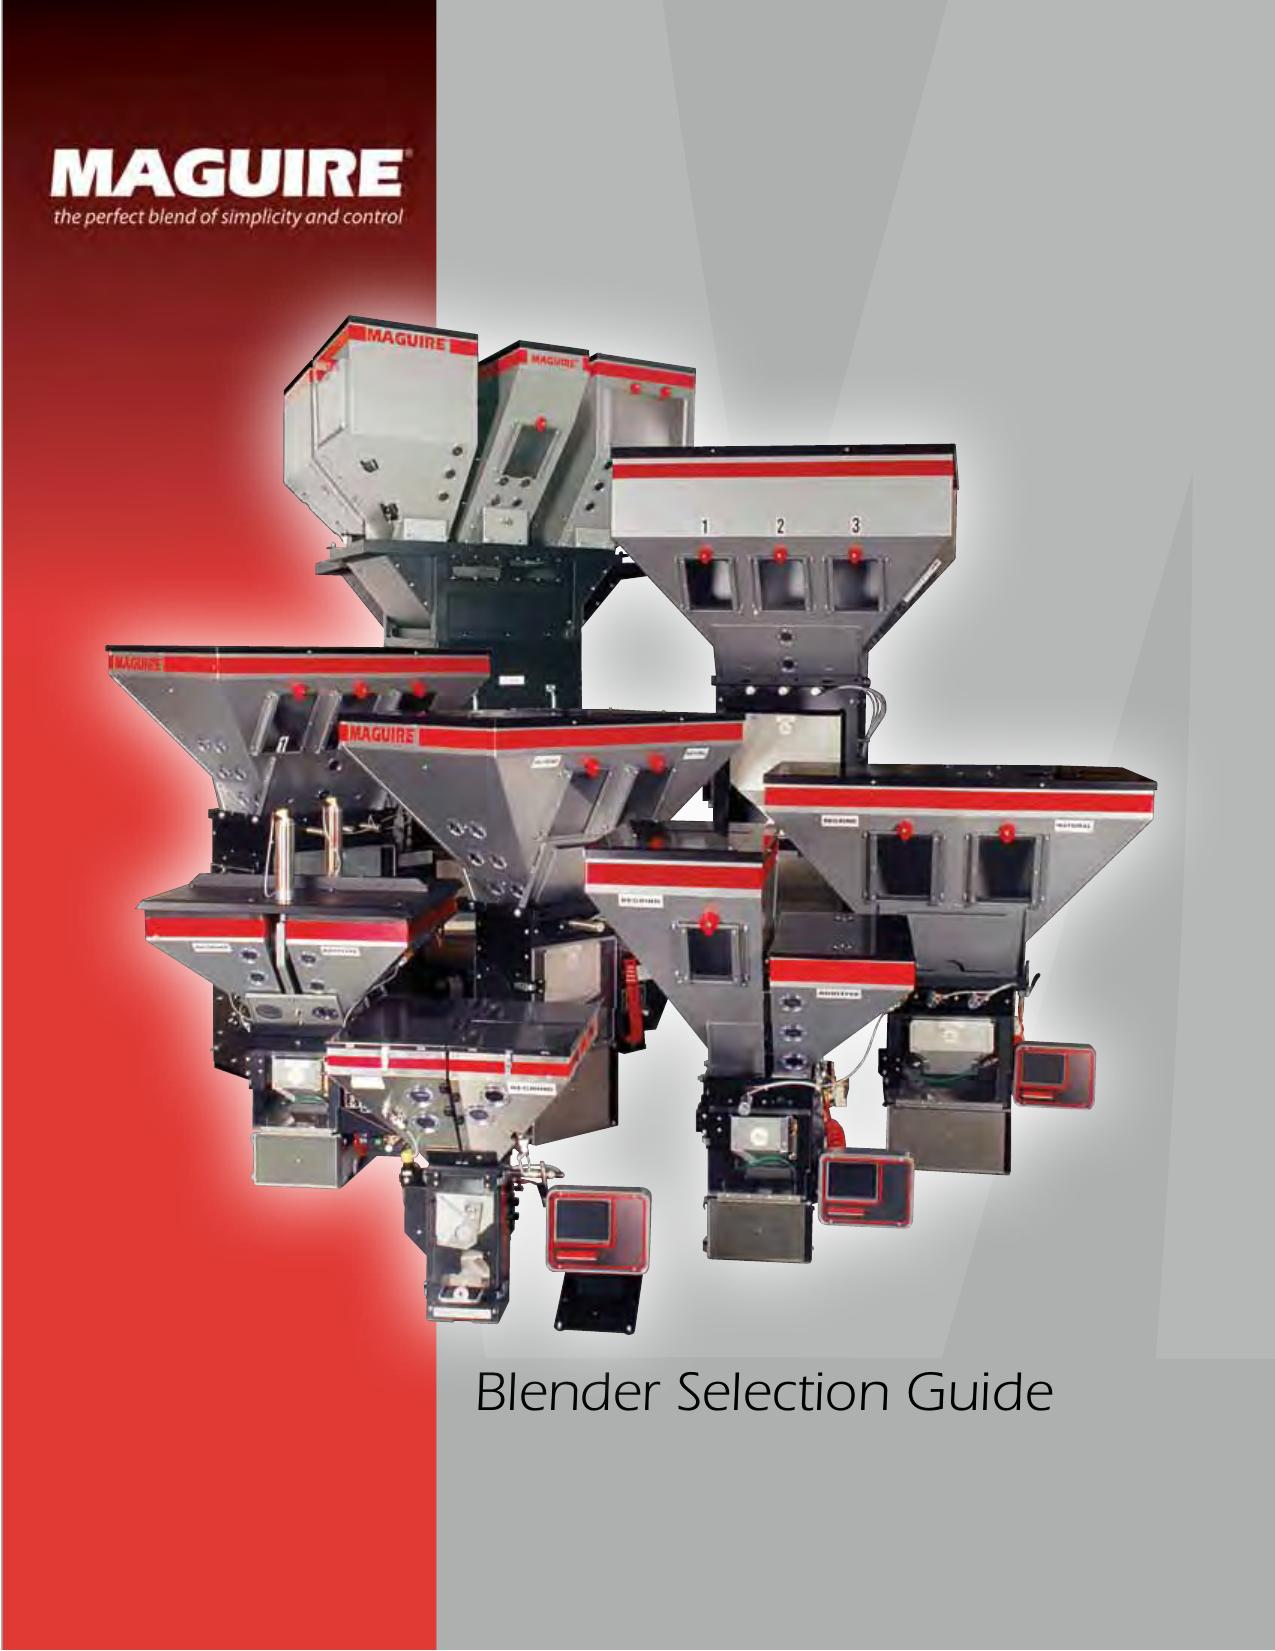 Maguire WSB Blender Guide | manualzz.com on